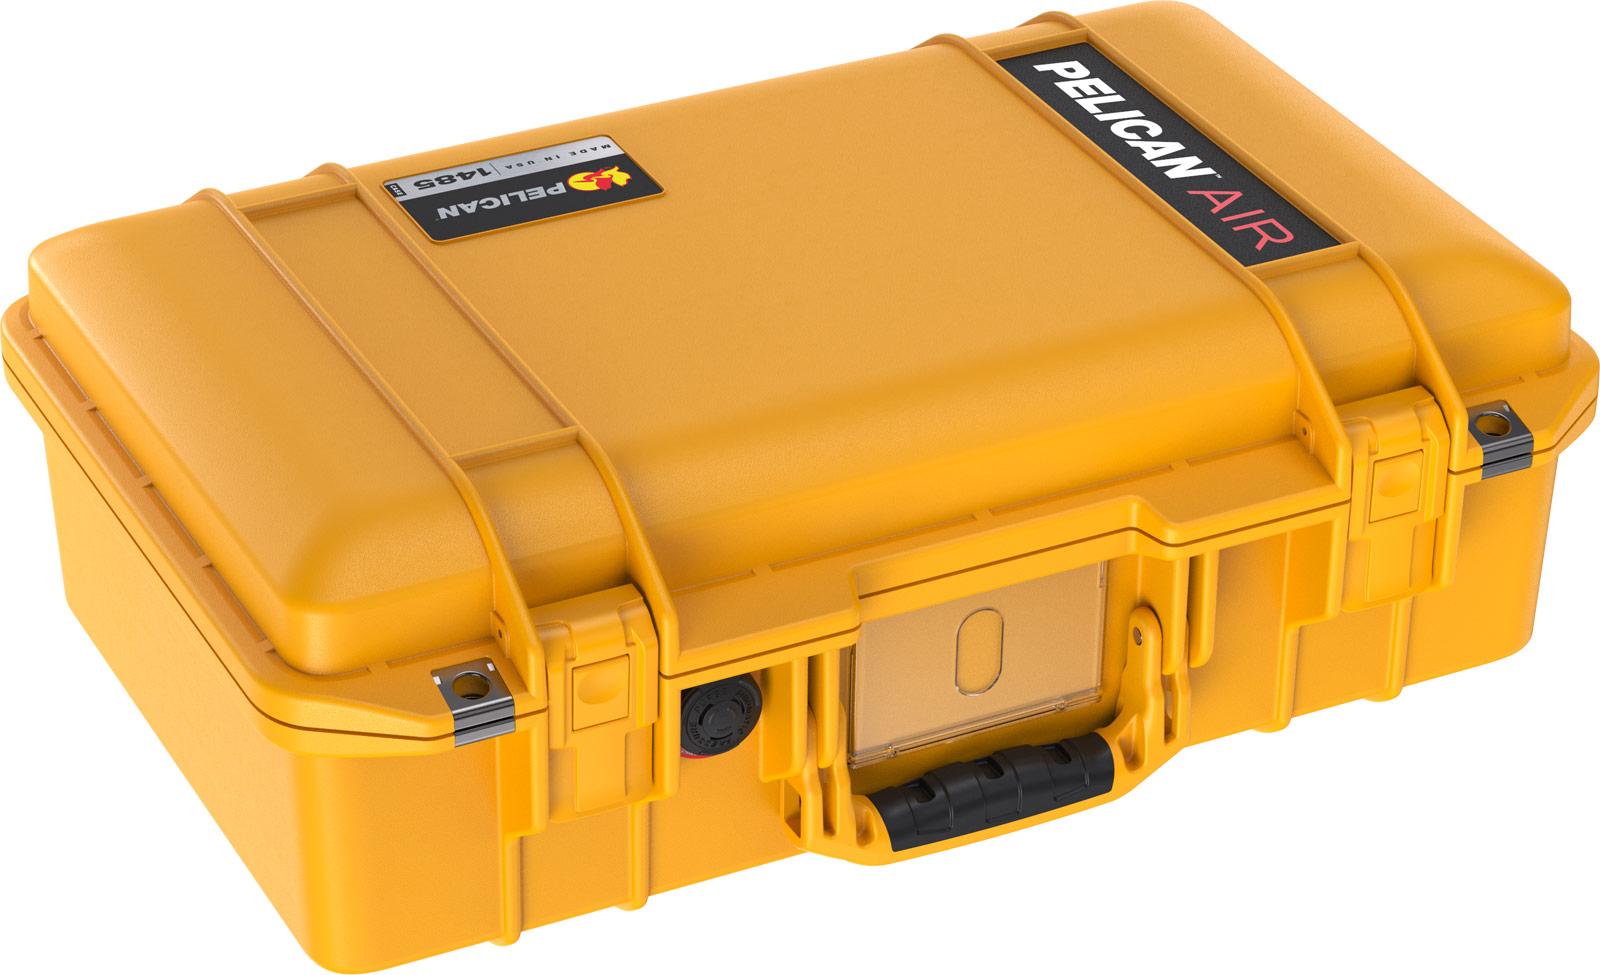 pelican yellow 1485 air case waterproof cases